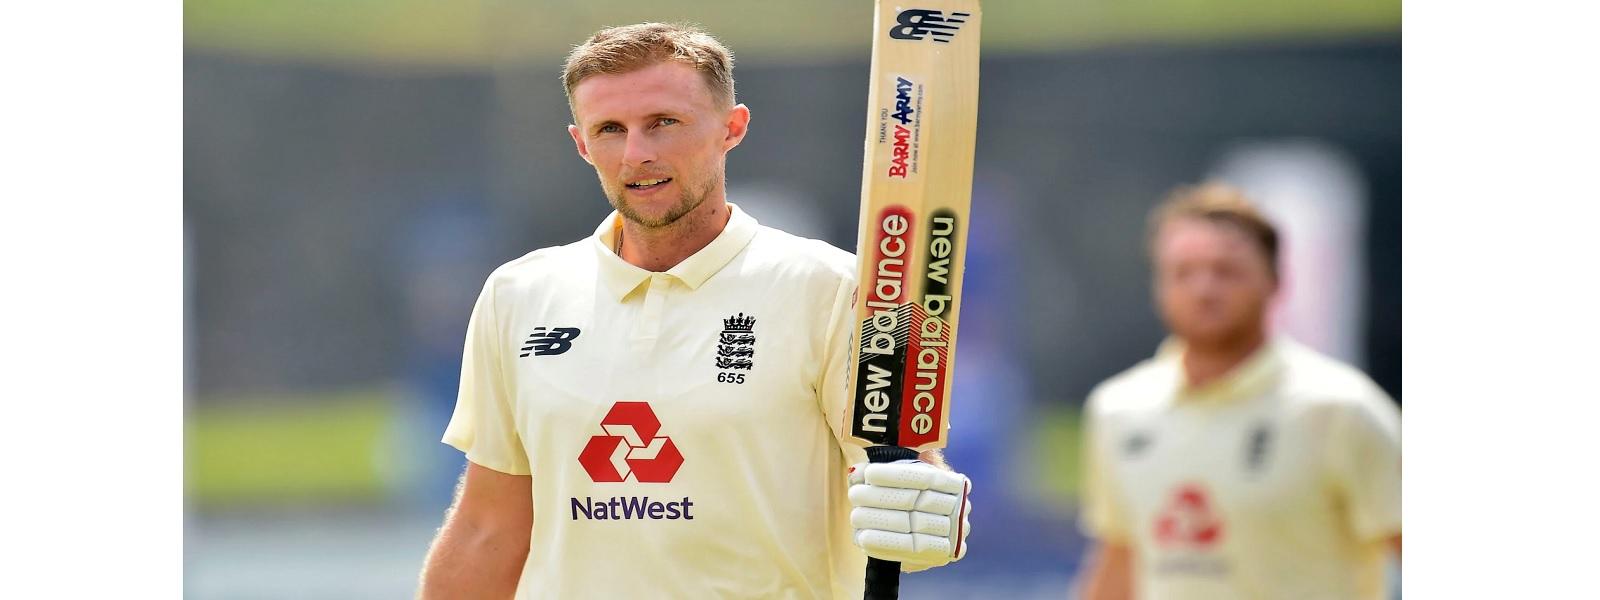 SL v ENG 2nd Test: முதல் இன்னிங்ஸில் 9 விக்கெட் இழப்பிற்கு 339 ஓட்டங்களைப் பெற்றது இங்கிலாந்து